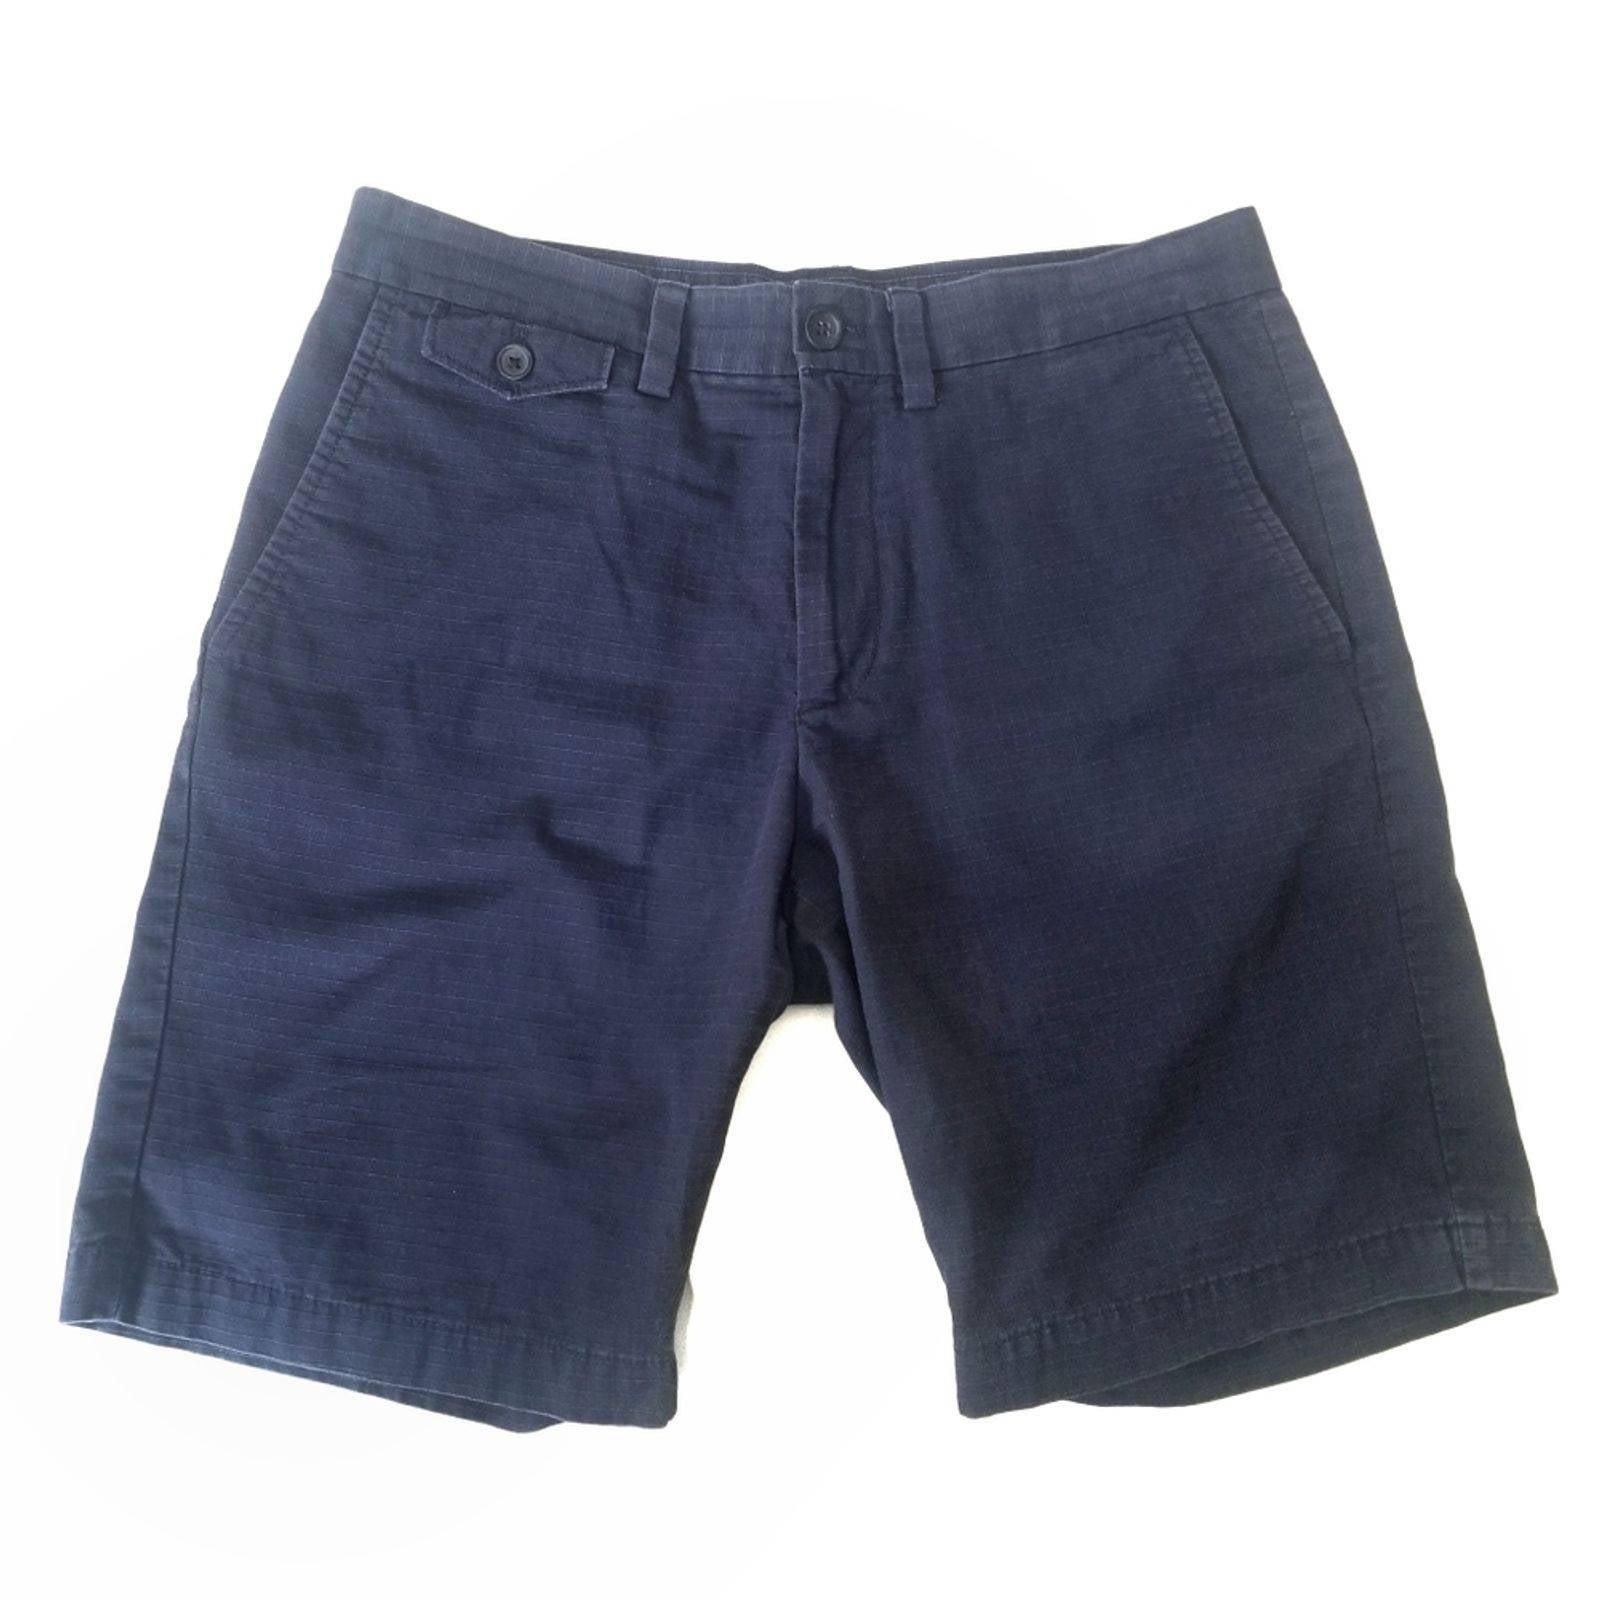 Ripstop Slim Textured Shorts